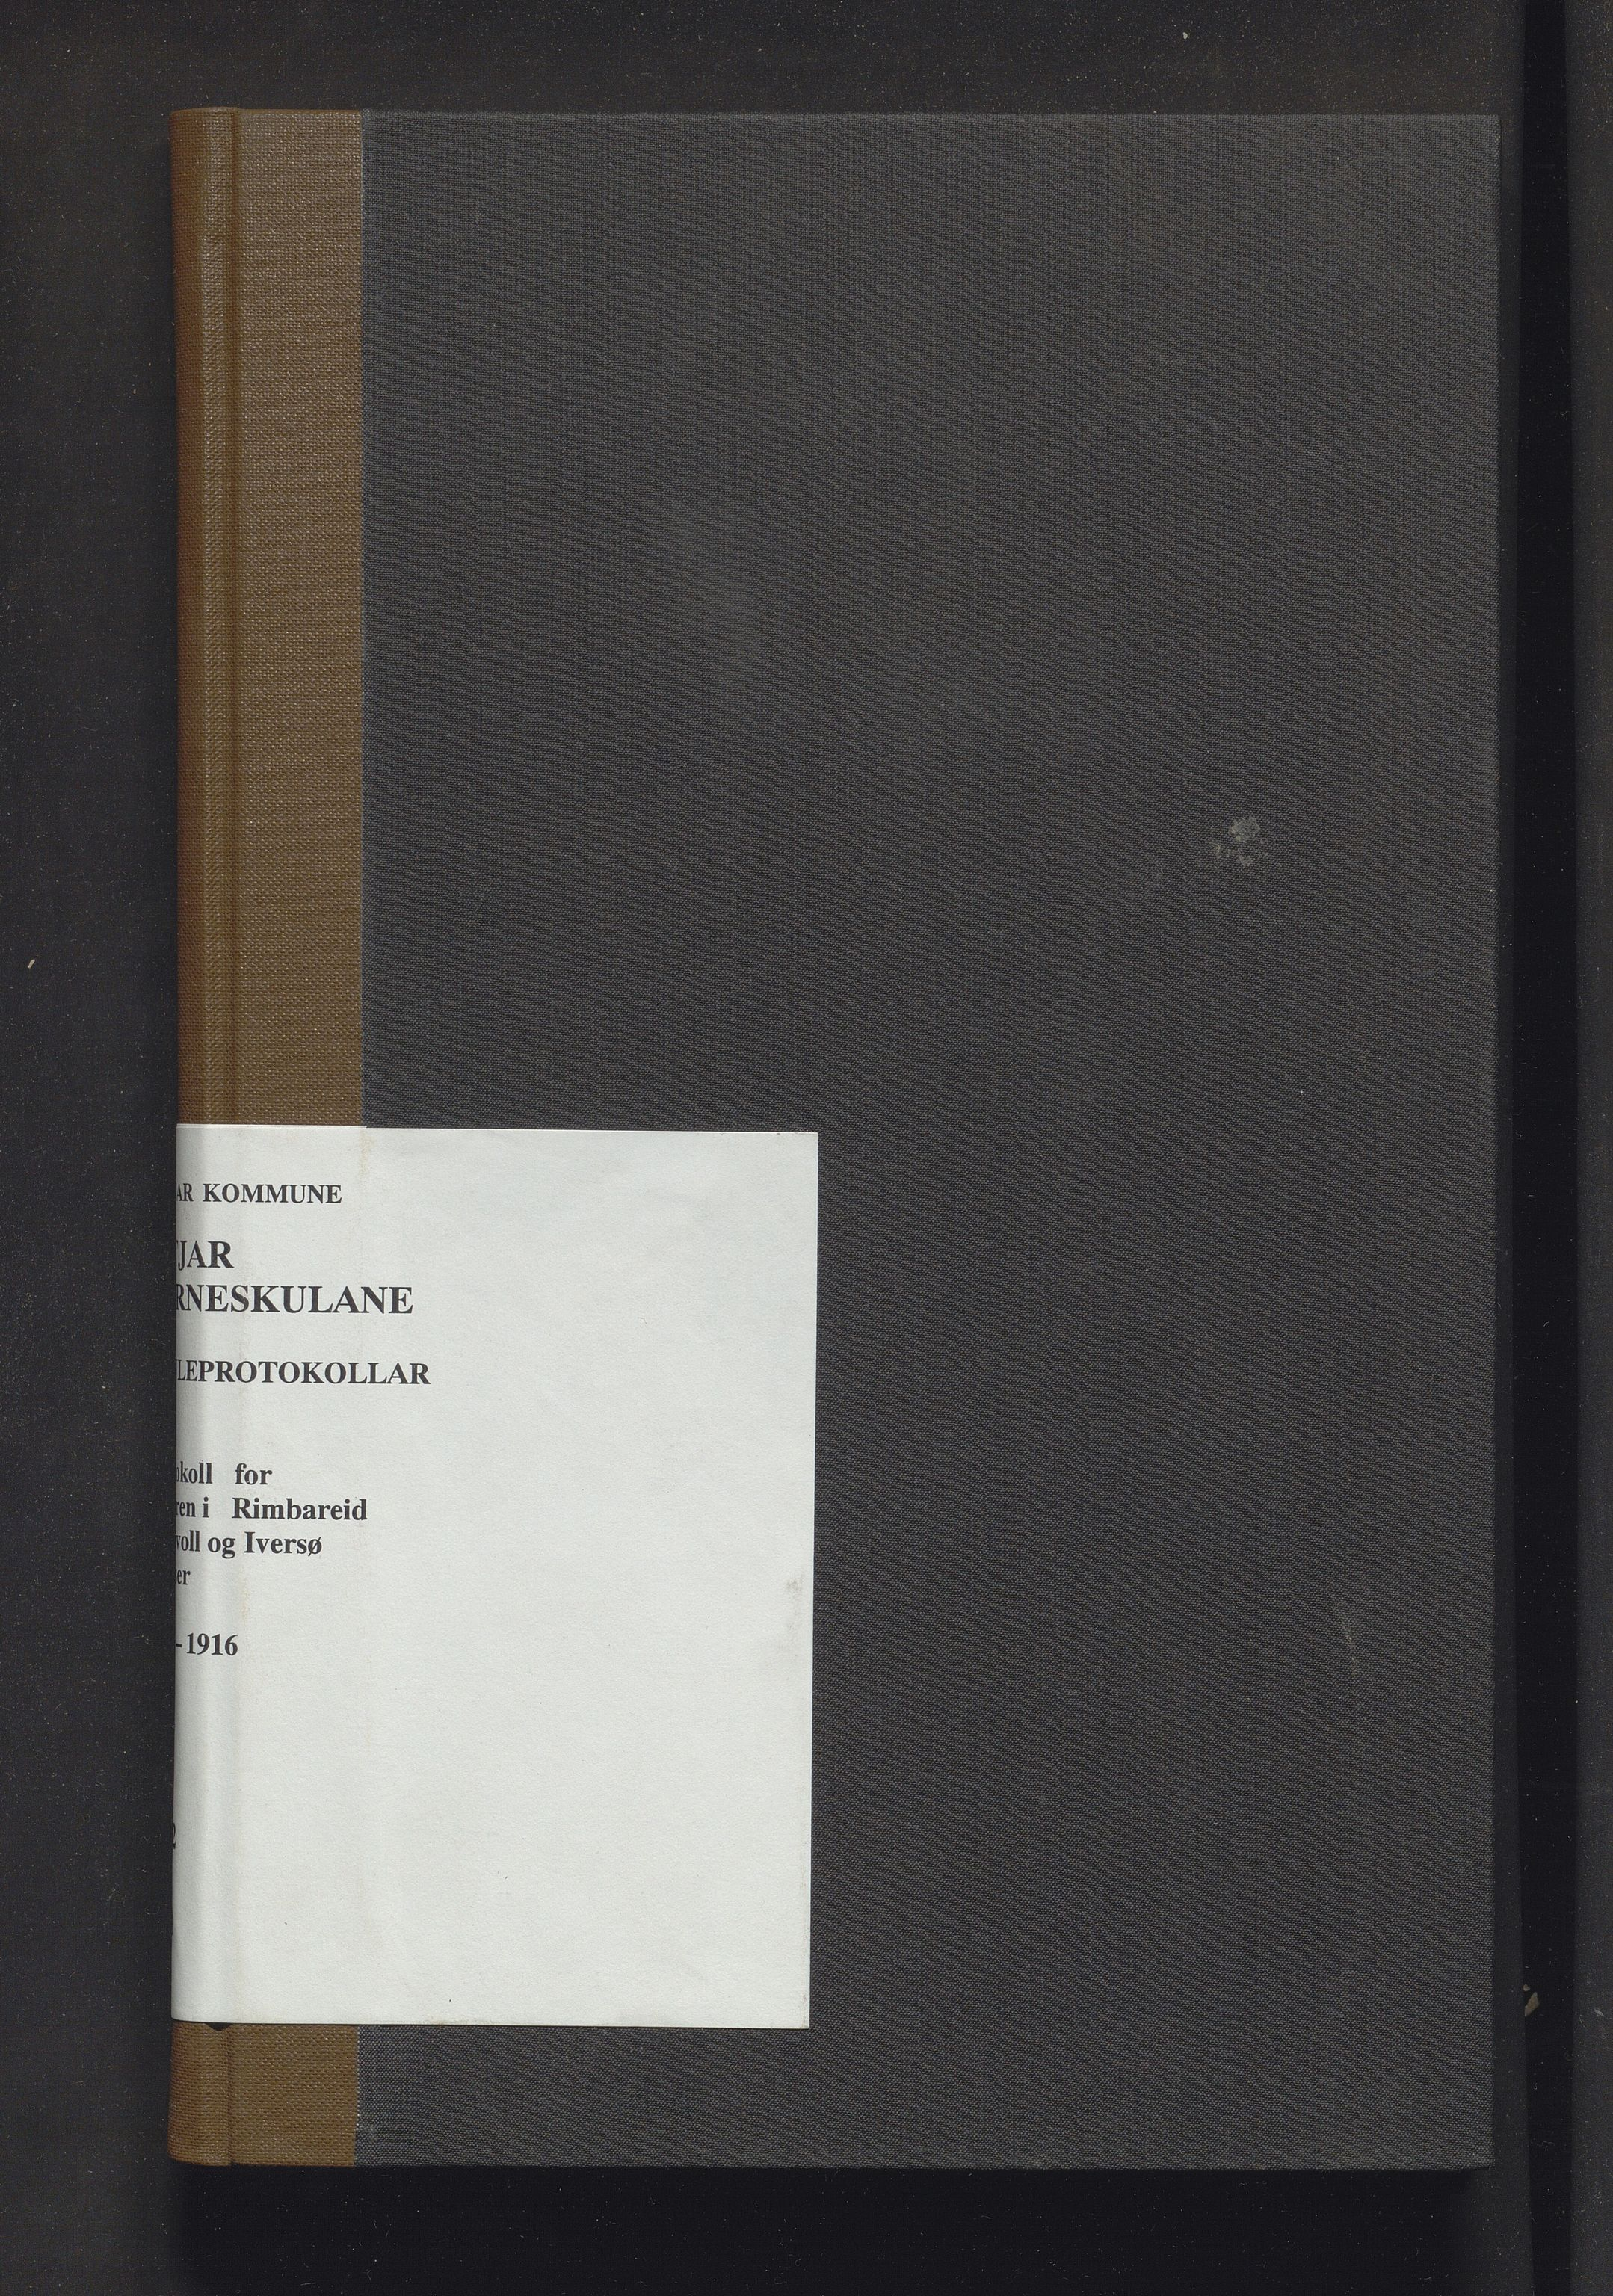 IKAH, Fitjar kommune. Barneskulane, F/Fa/L0008: Skuleprotokoll for Rimbereid, Tislevoll, Iversø krinsar, 1878-1916